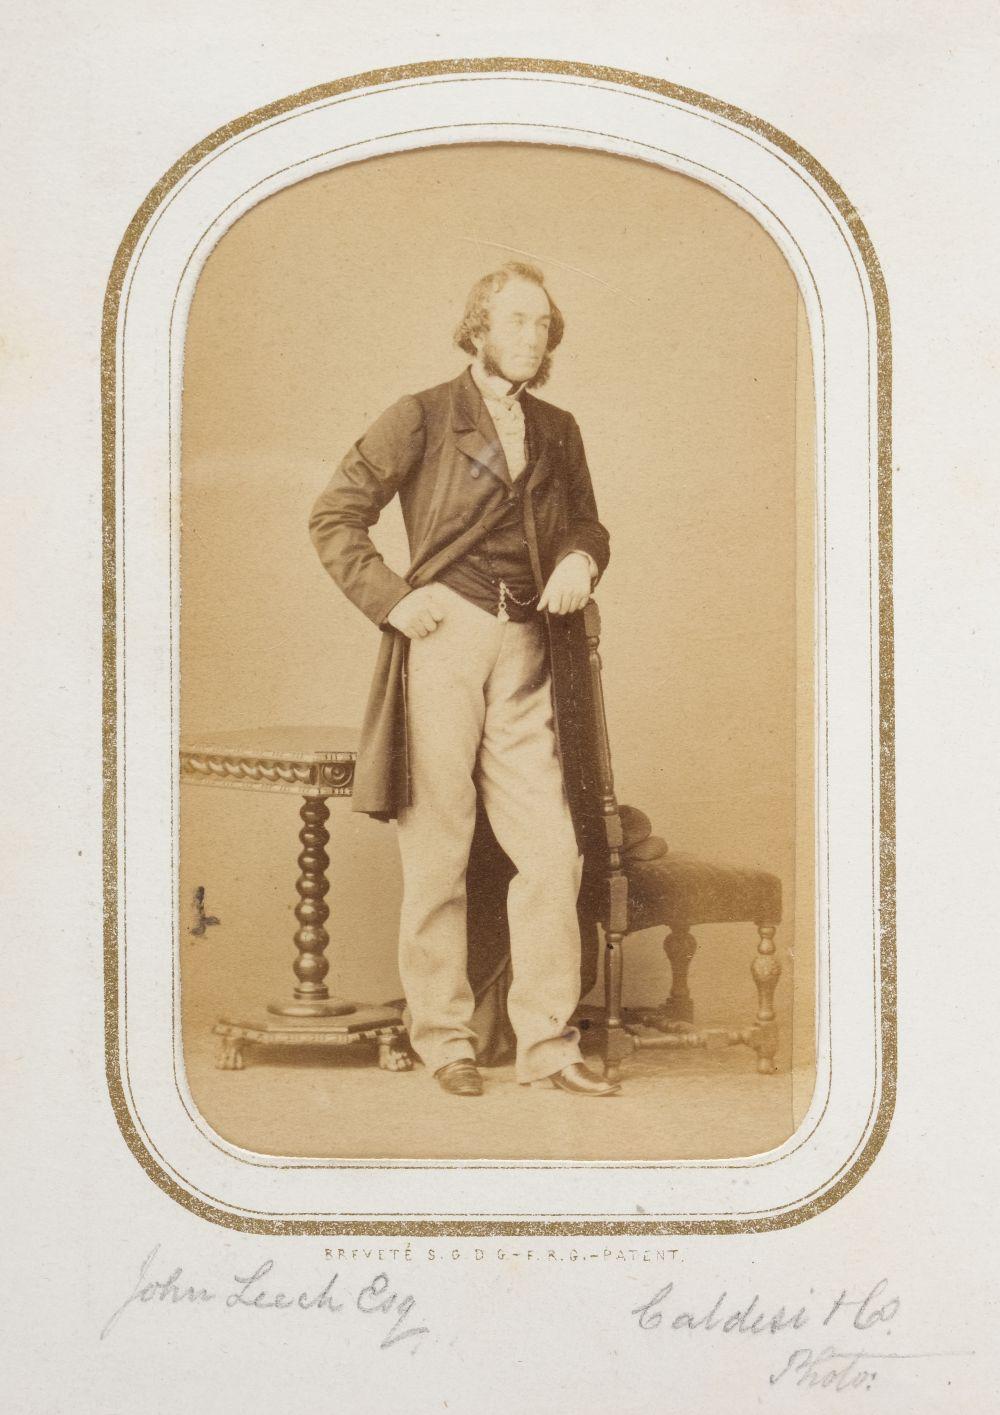 * Cartes de visite. A cartes-de-visite album, c. 1860s/1880s - Image 5 of 18